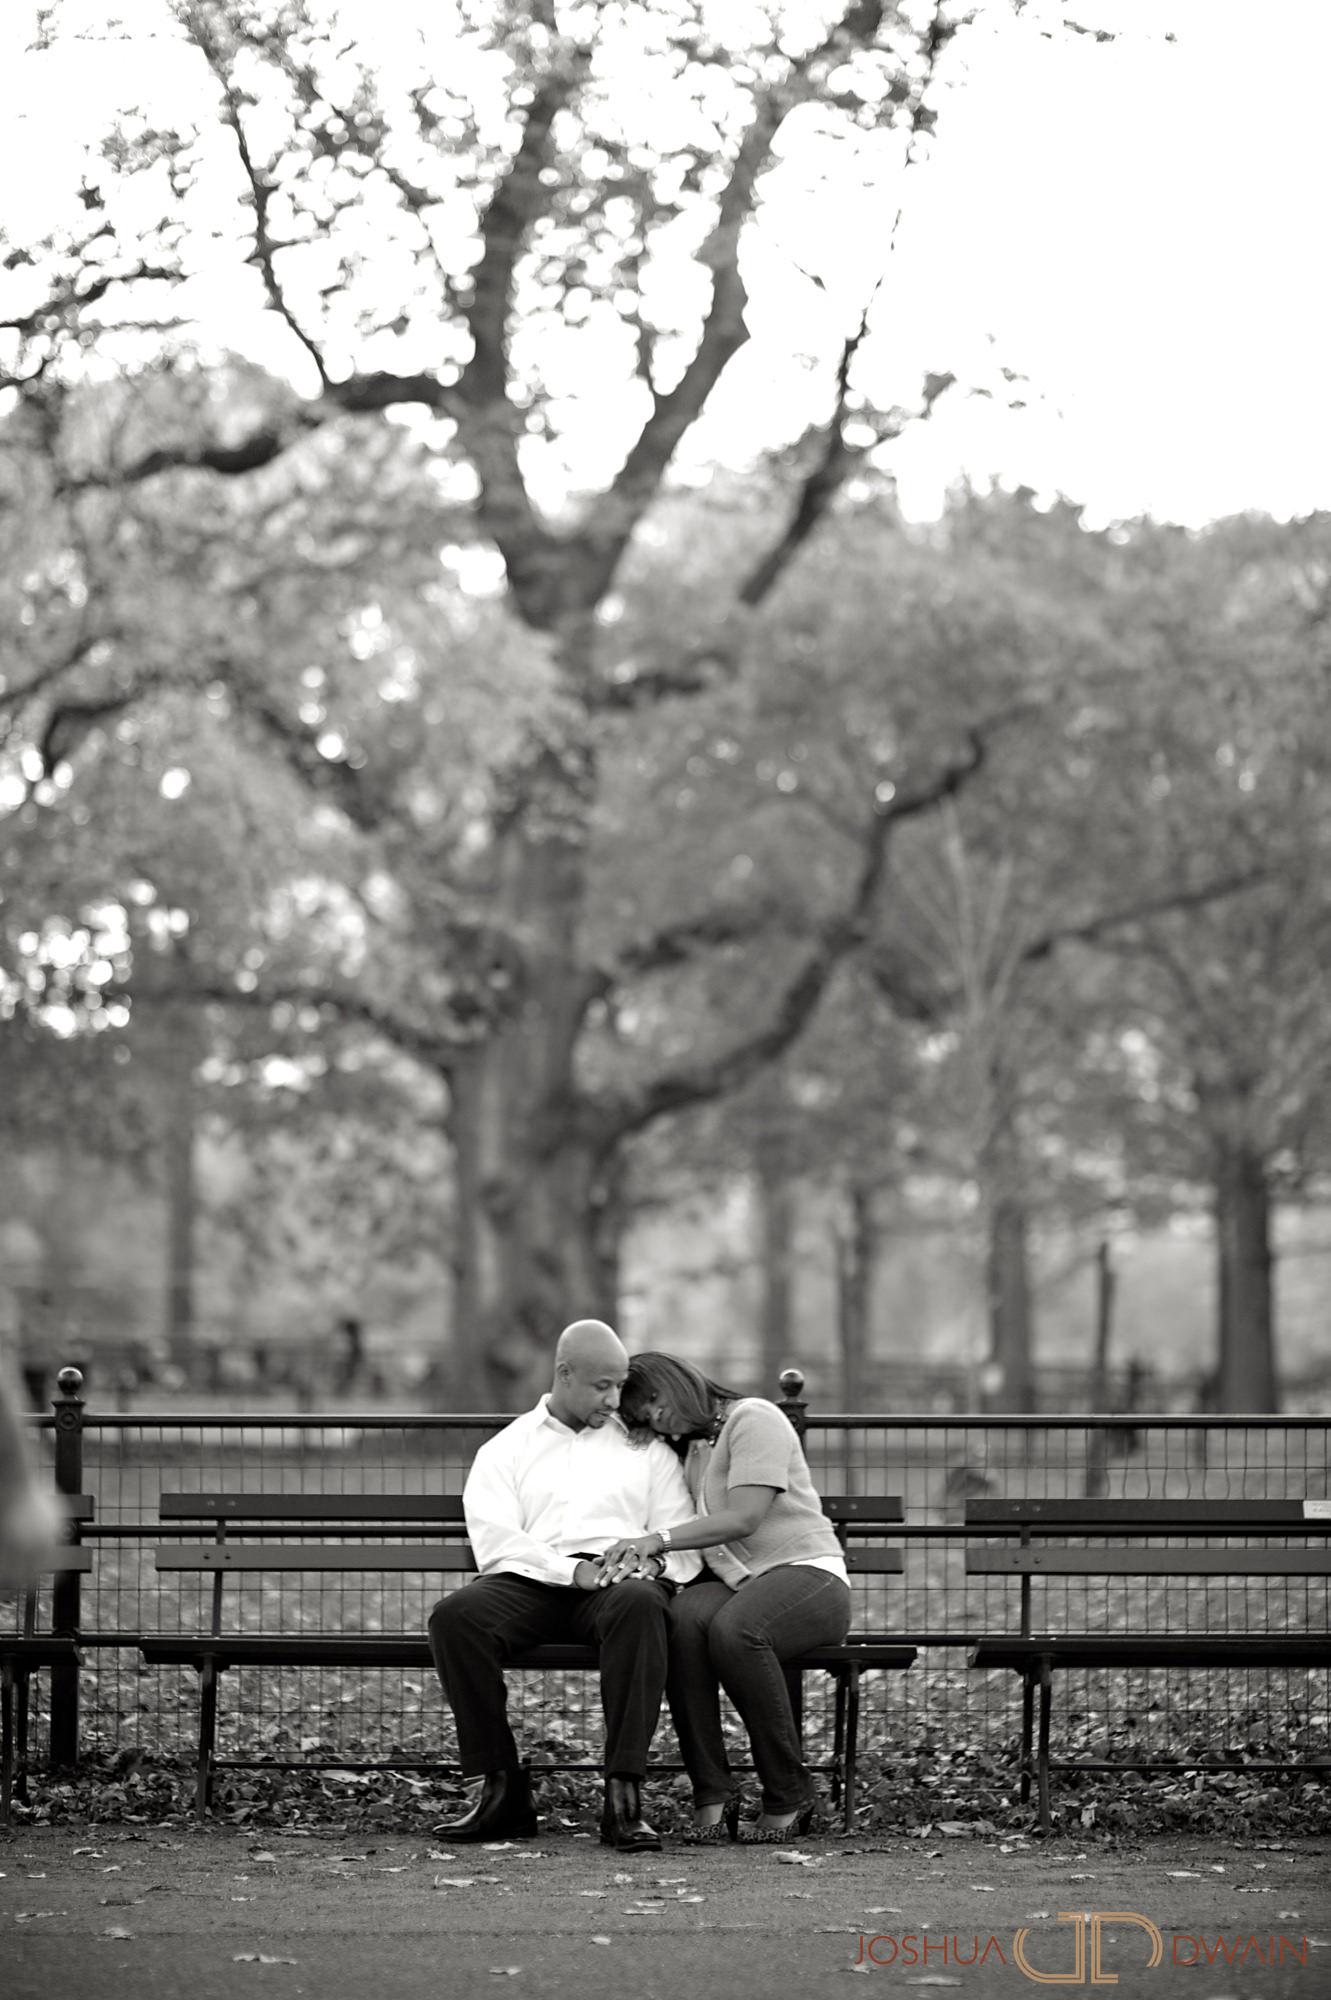 carol-shiloh-002-central-park-new-york-city-engagement-photographer-joshua-dwain-05